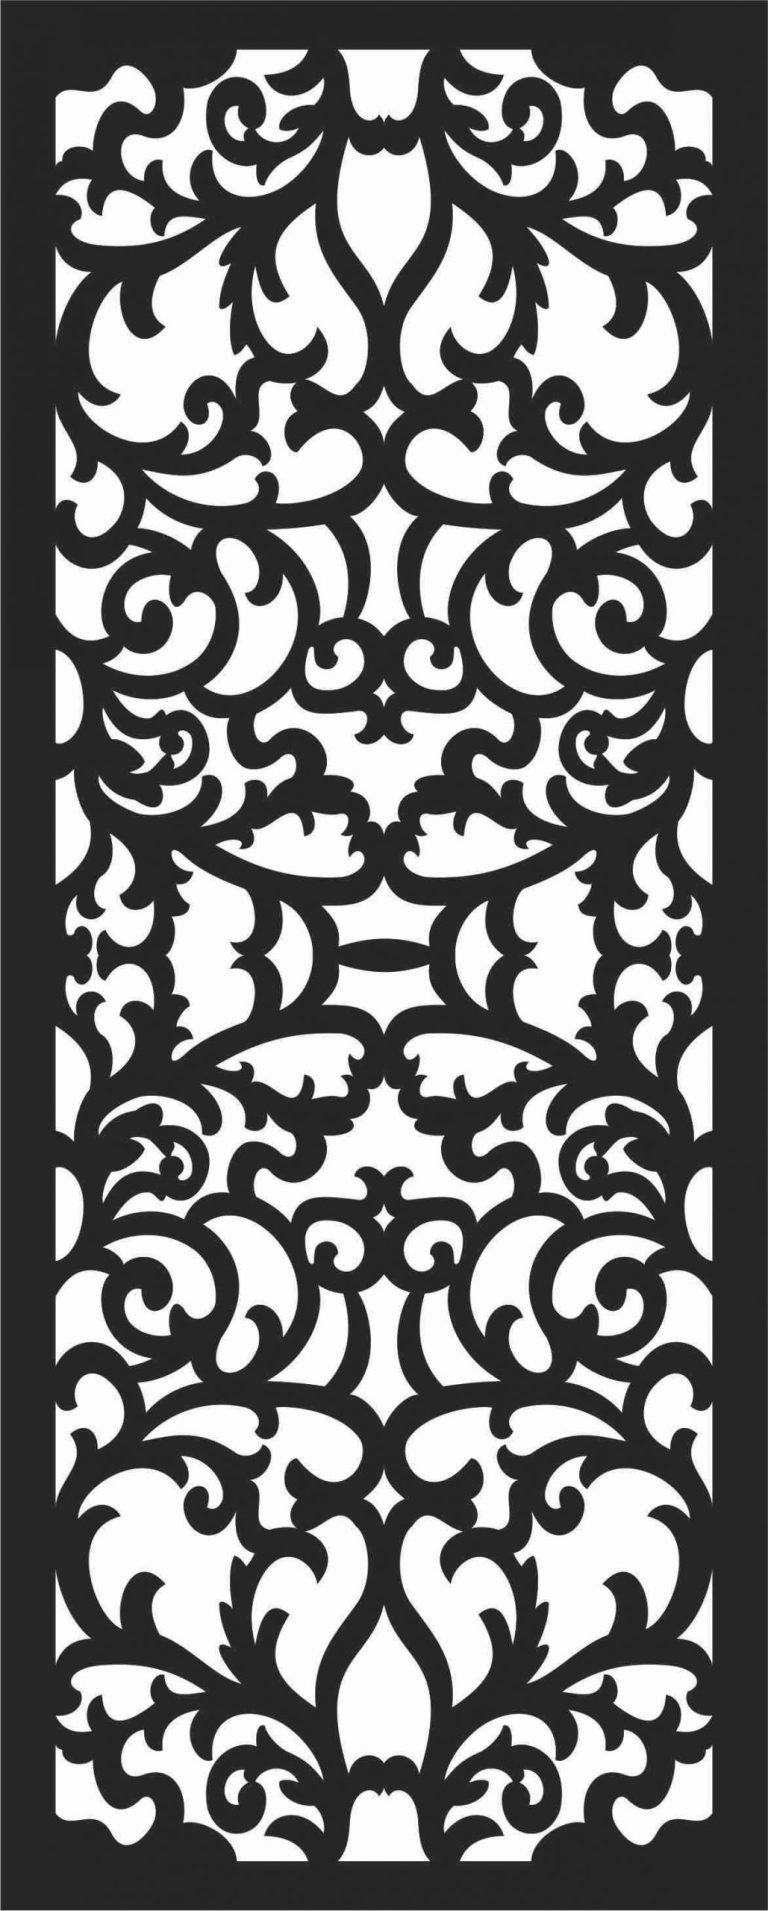 Screen Panel Patterns Seamless 42 Free DXF File